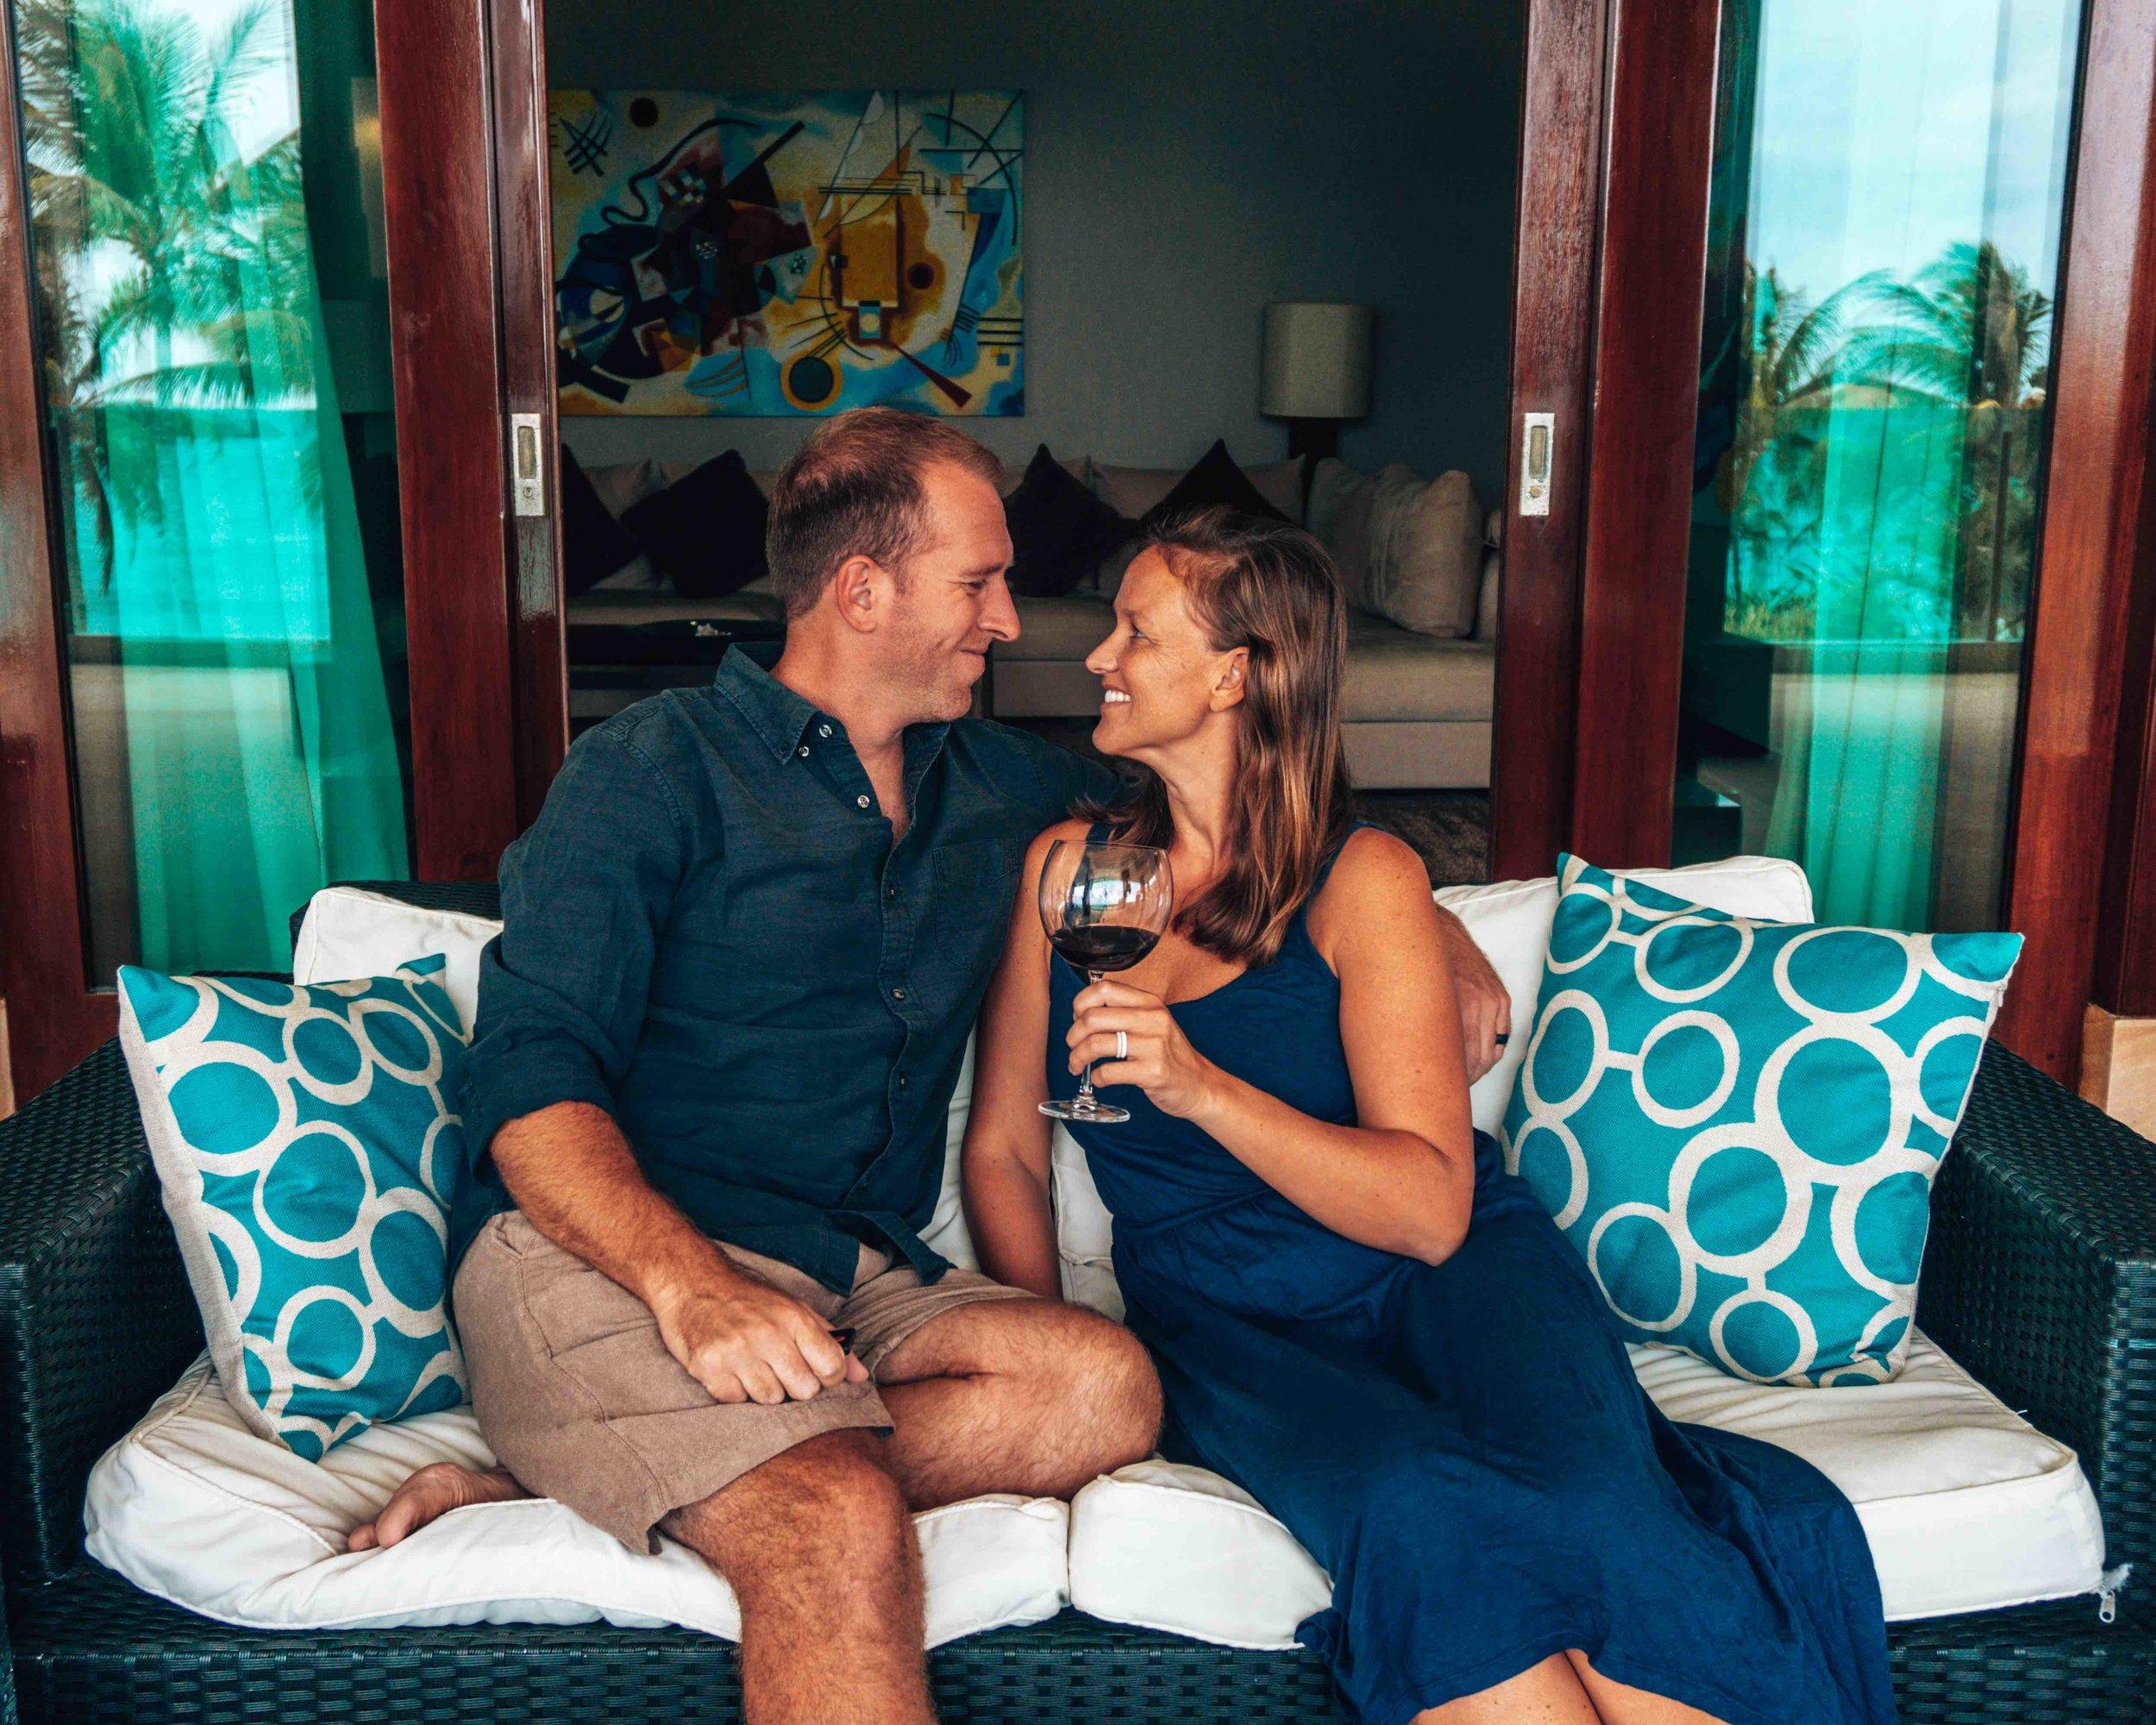 Lifestyle_family_couple_happy hour_boracay_under the stars luxury apartments_wine_love.jpg